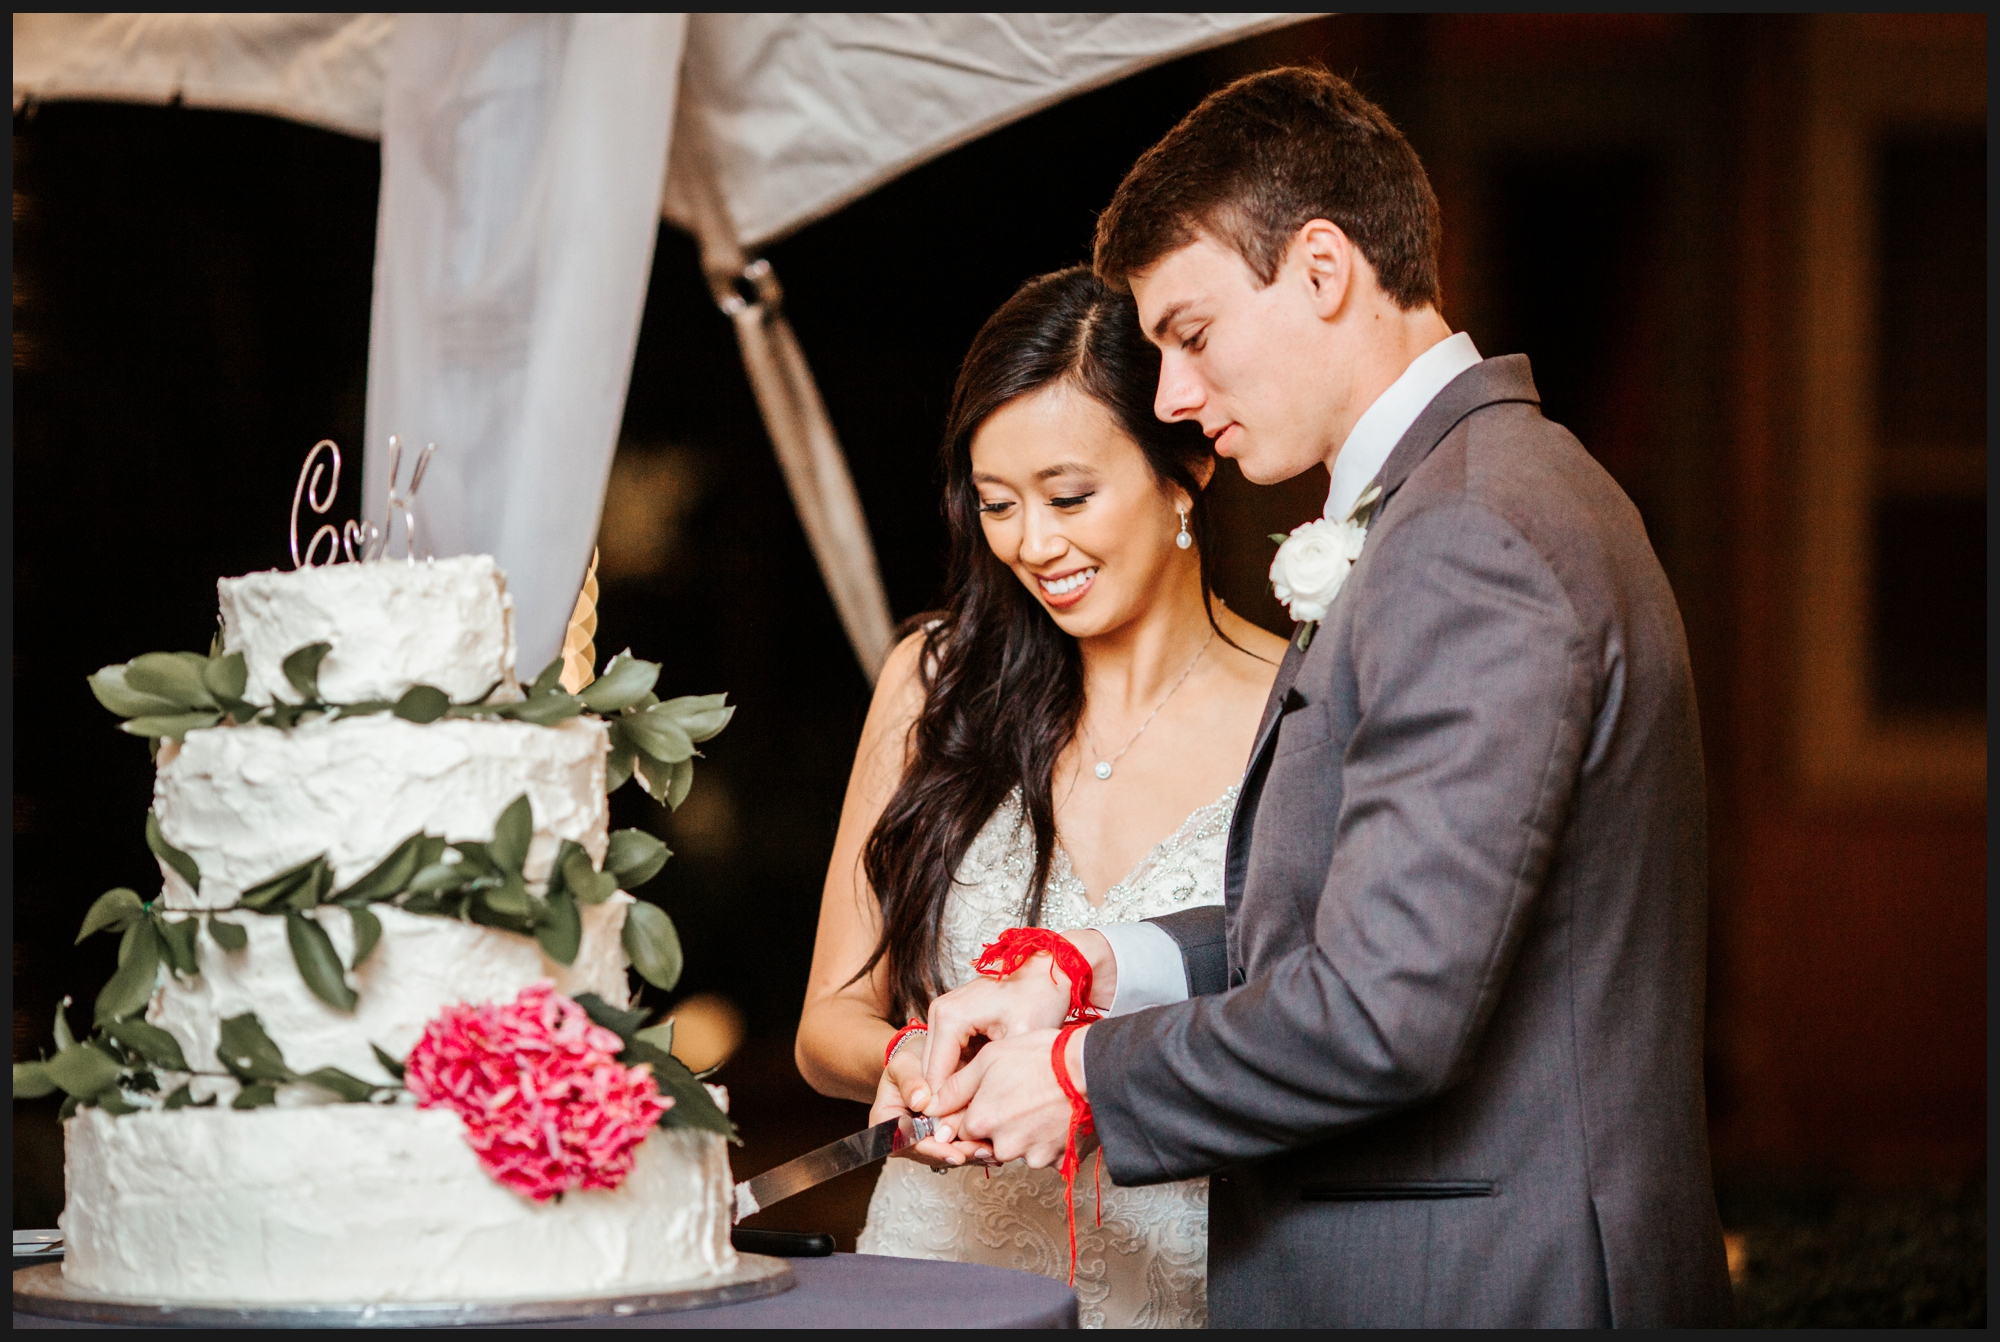 Orlando-Wedding-Photographer-destination-wedding-photographer-florida-wedding-photographer-bohemian-wedding-photographer_1450.jpg